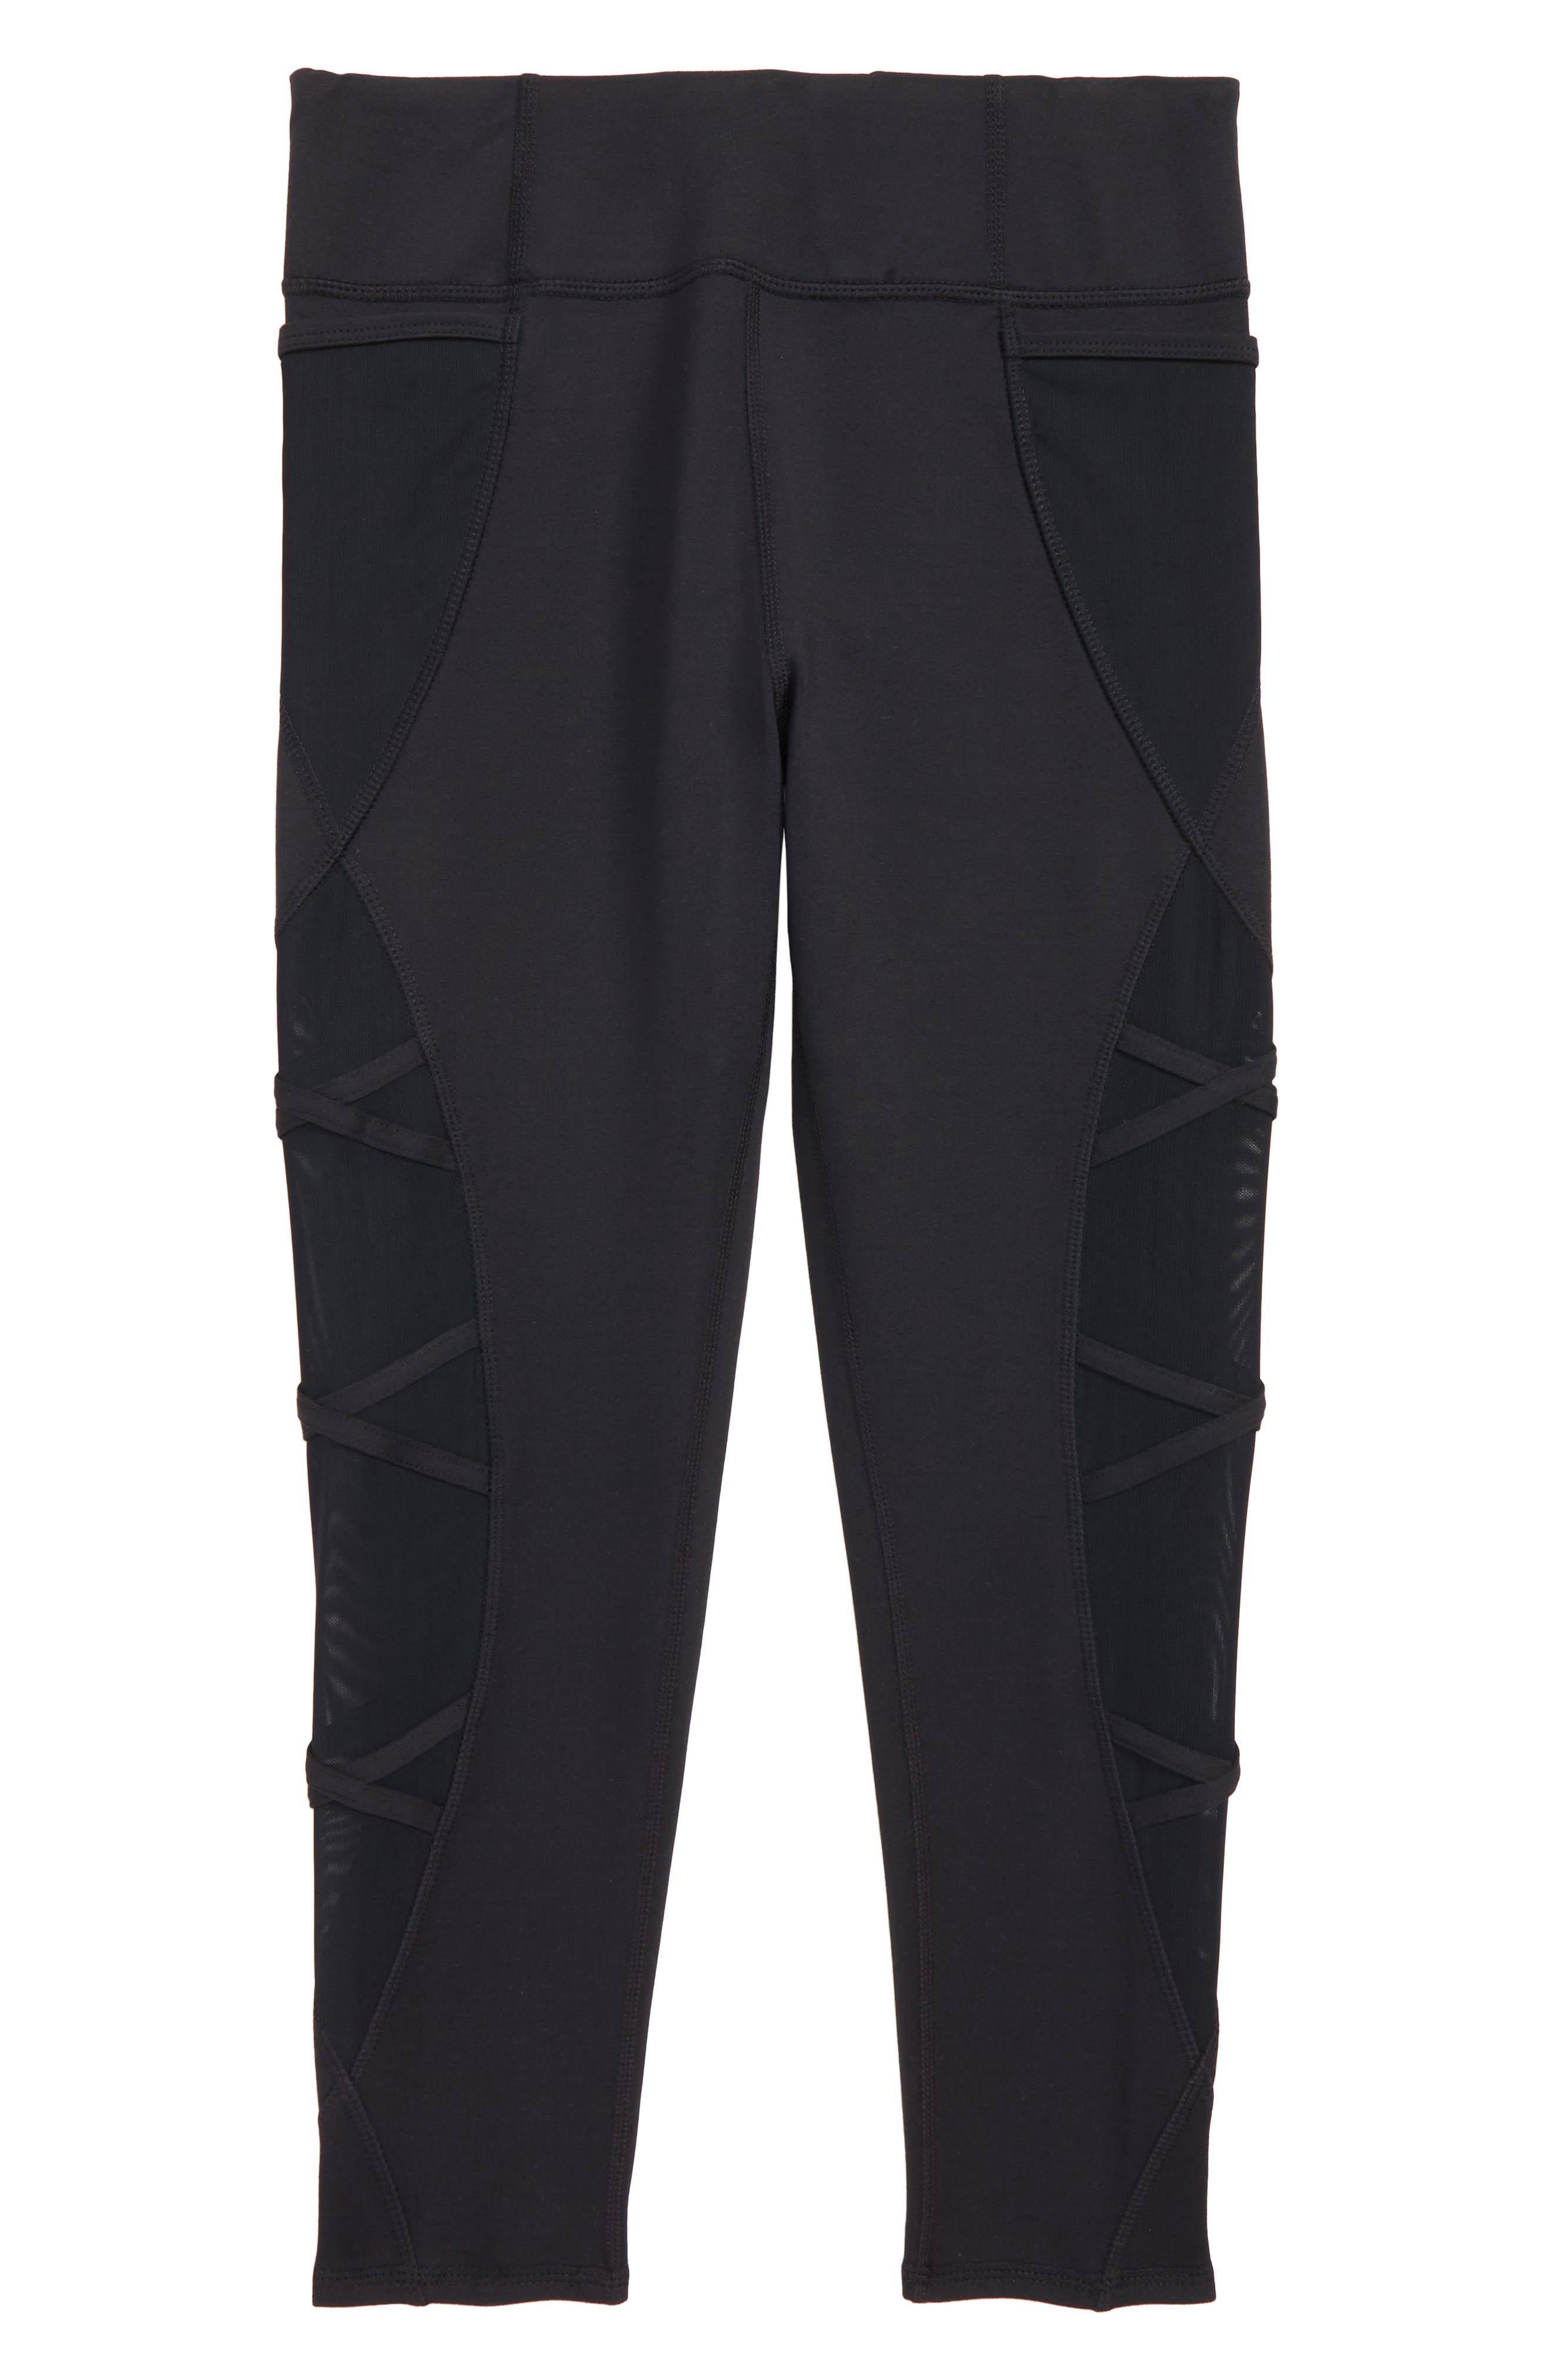 Mesh Crisscross Crop Leggings,                         Main,                         color, Black